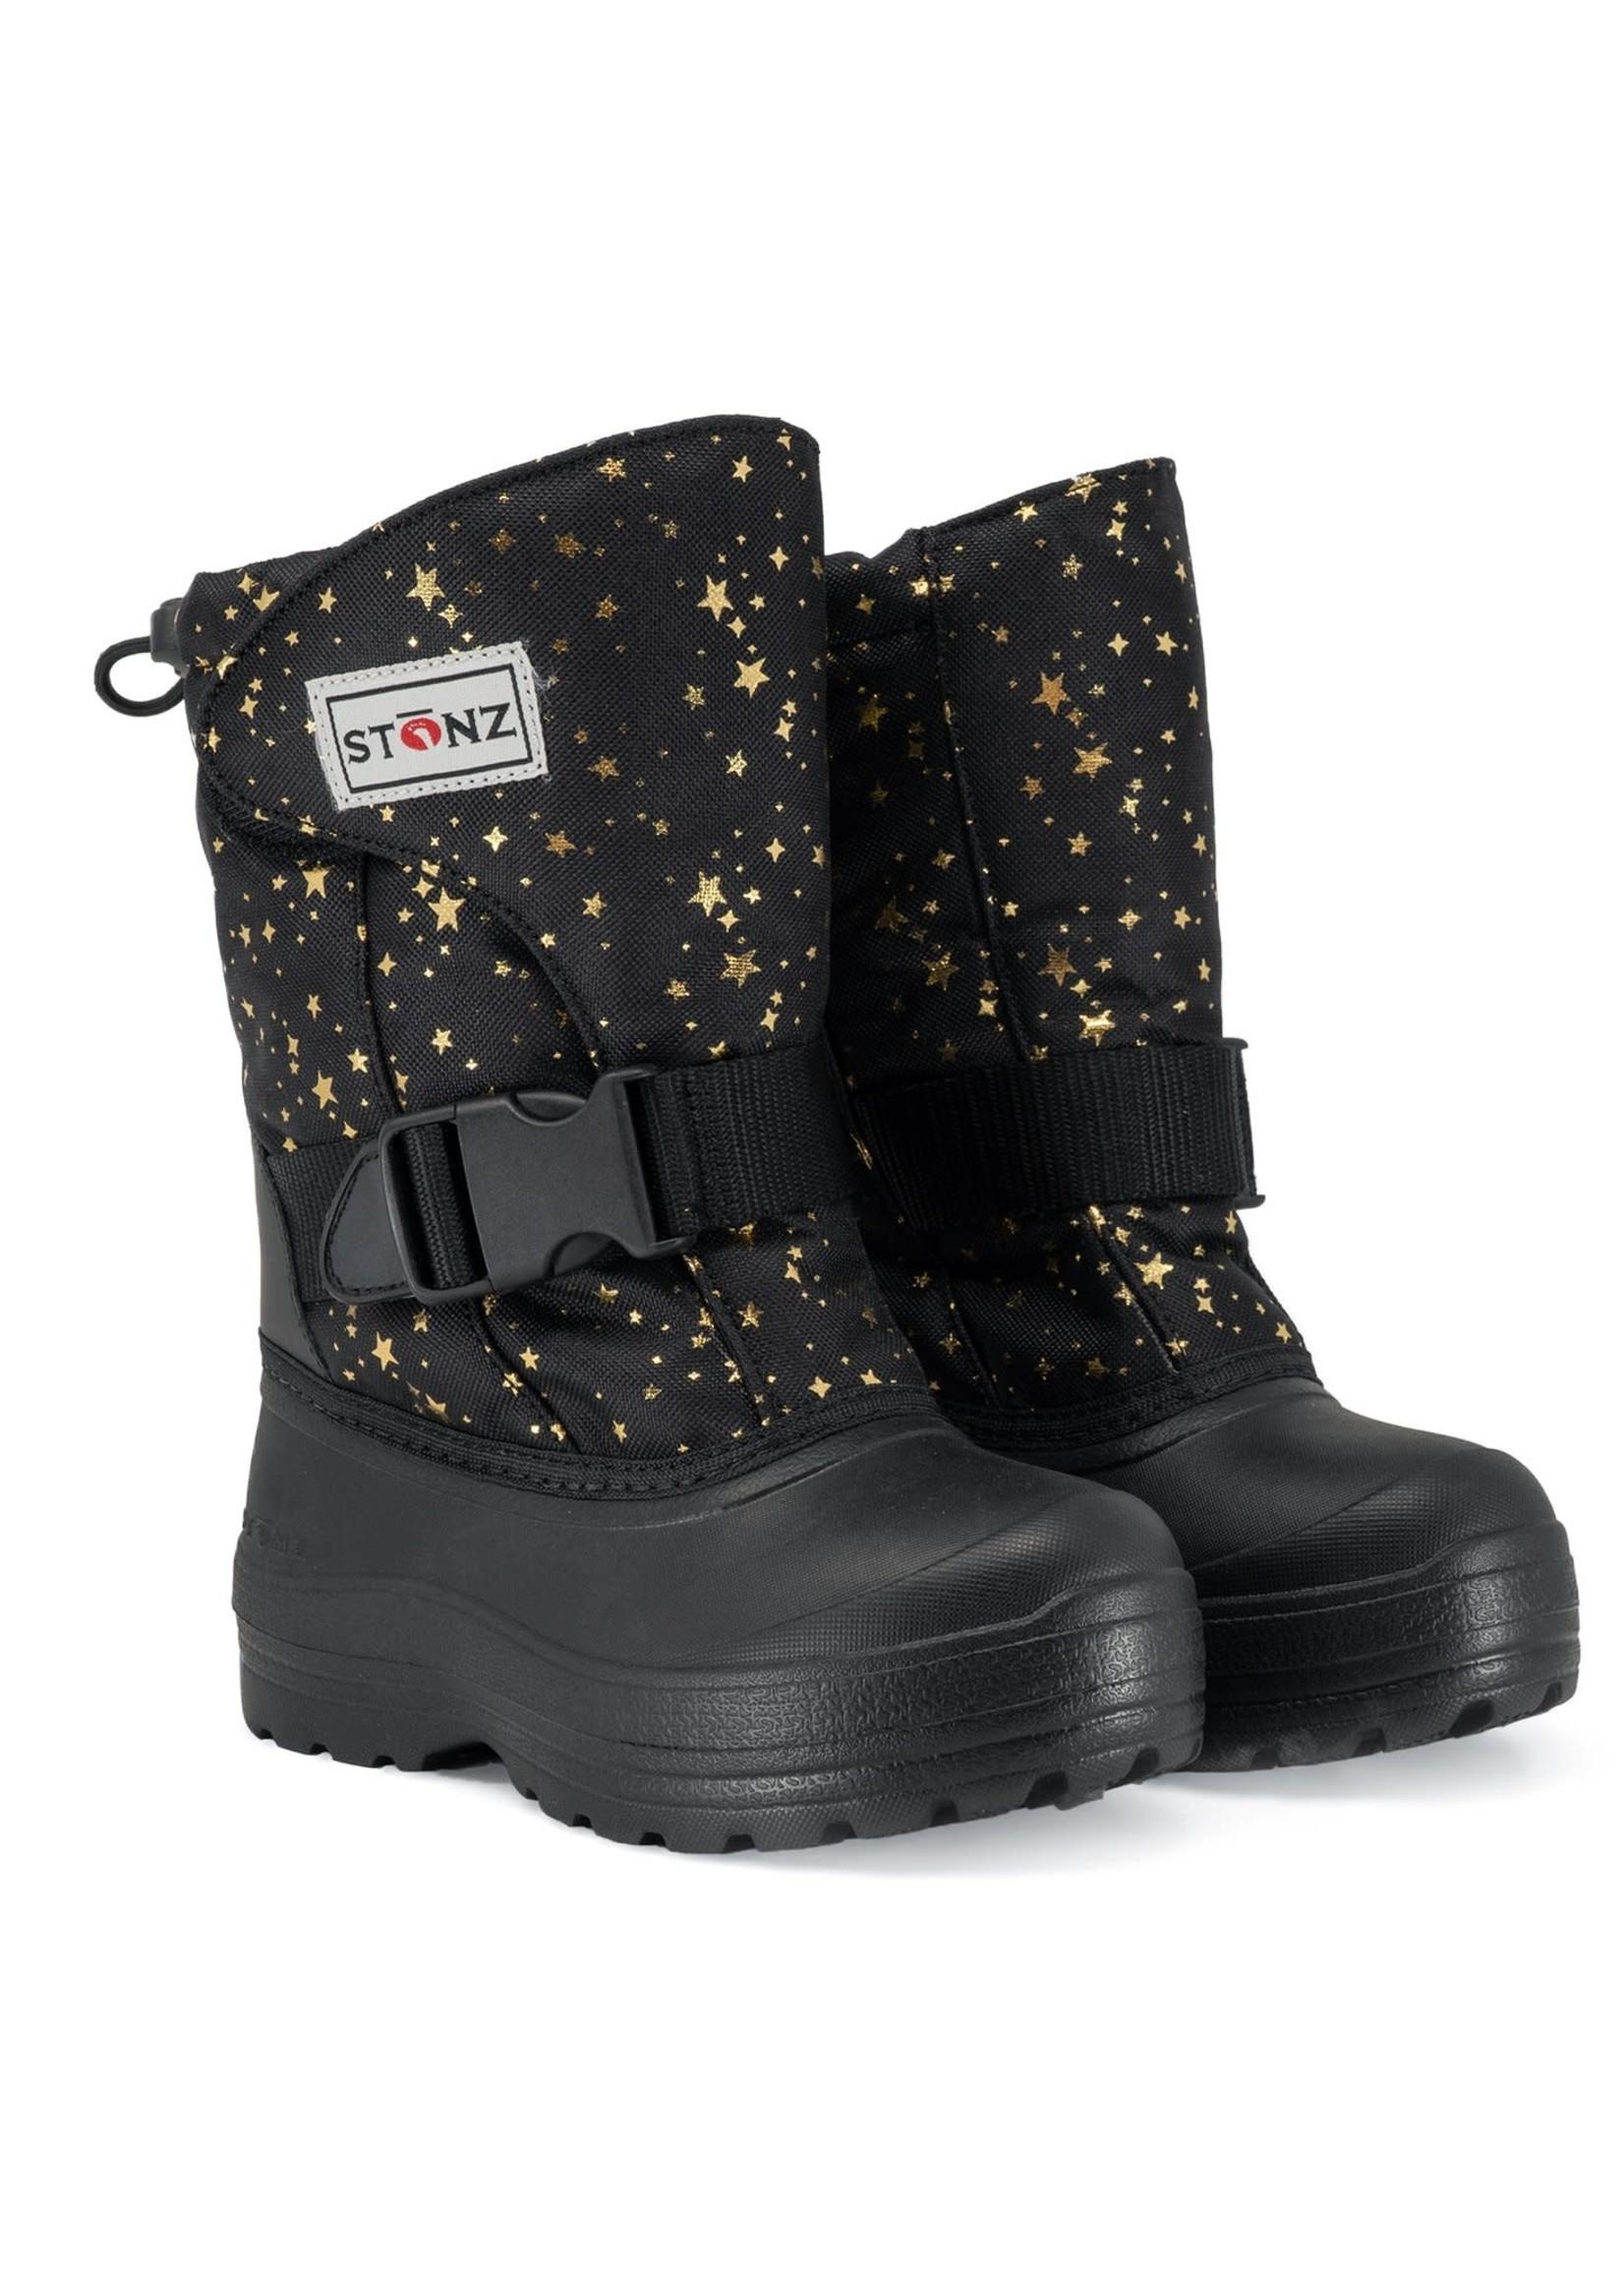 stonz Stonz Boots (Golden Star)